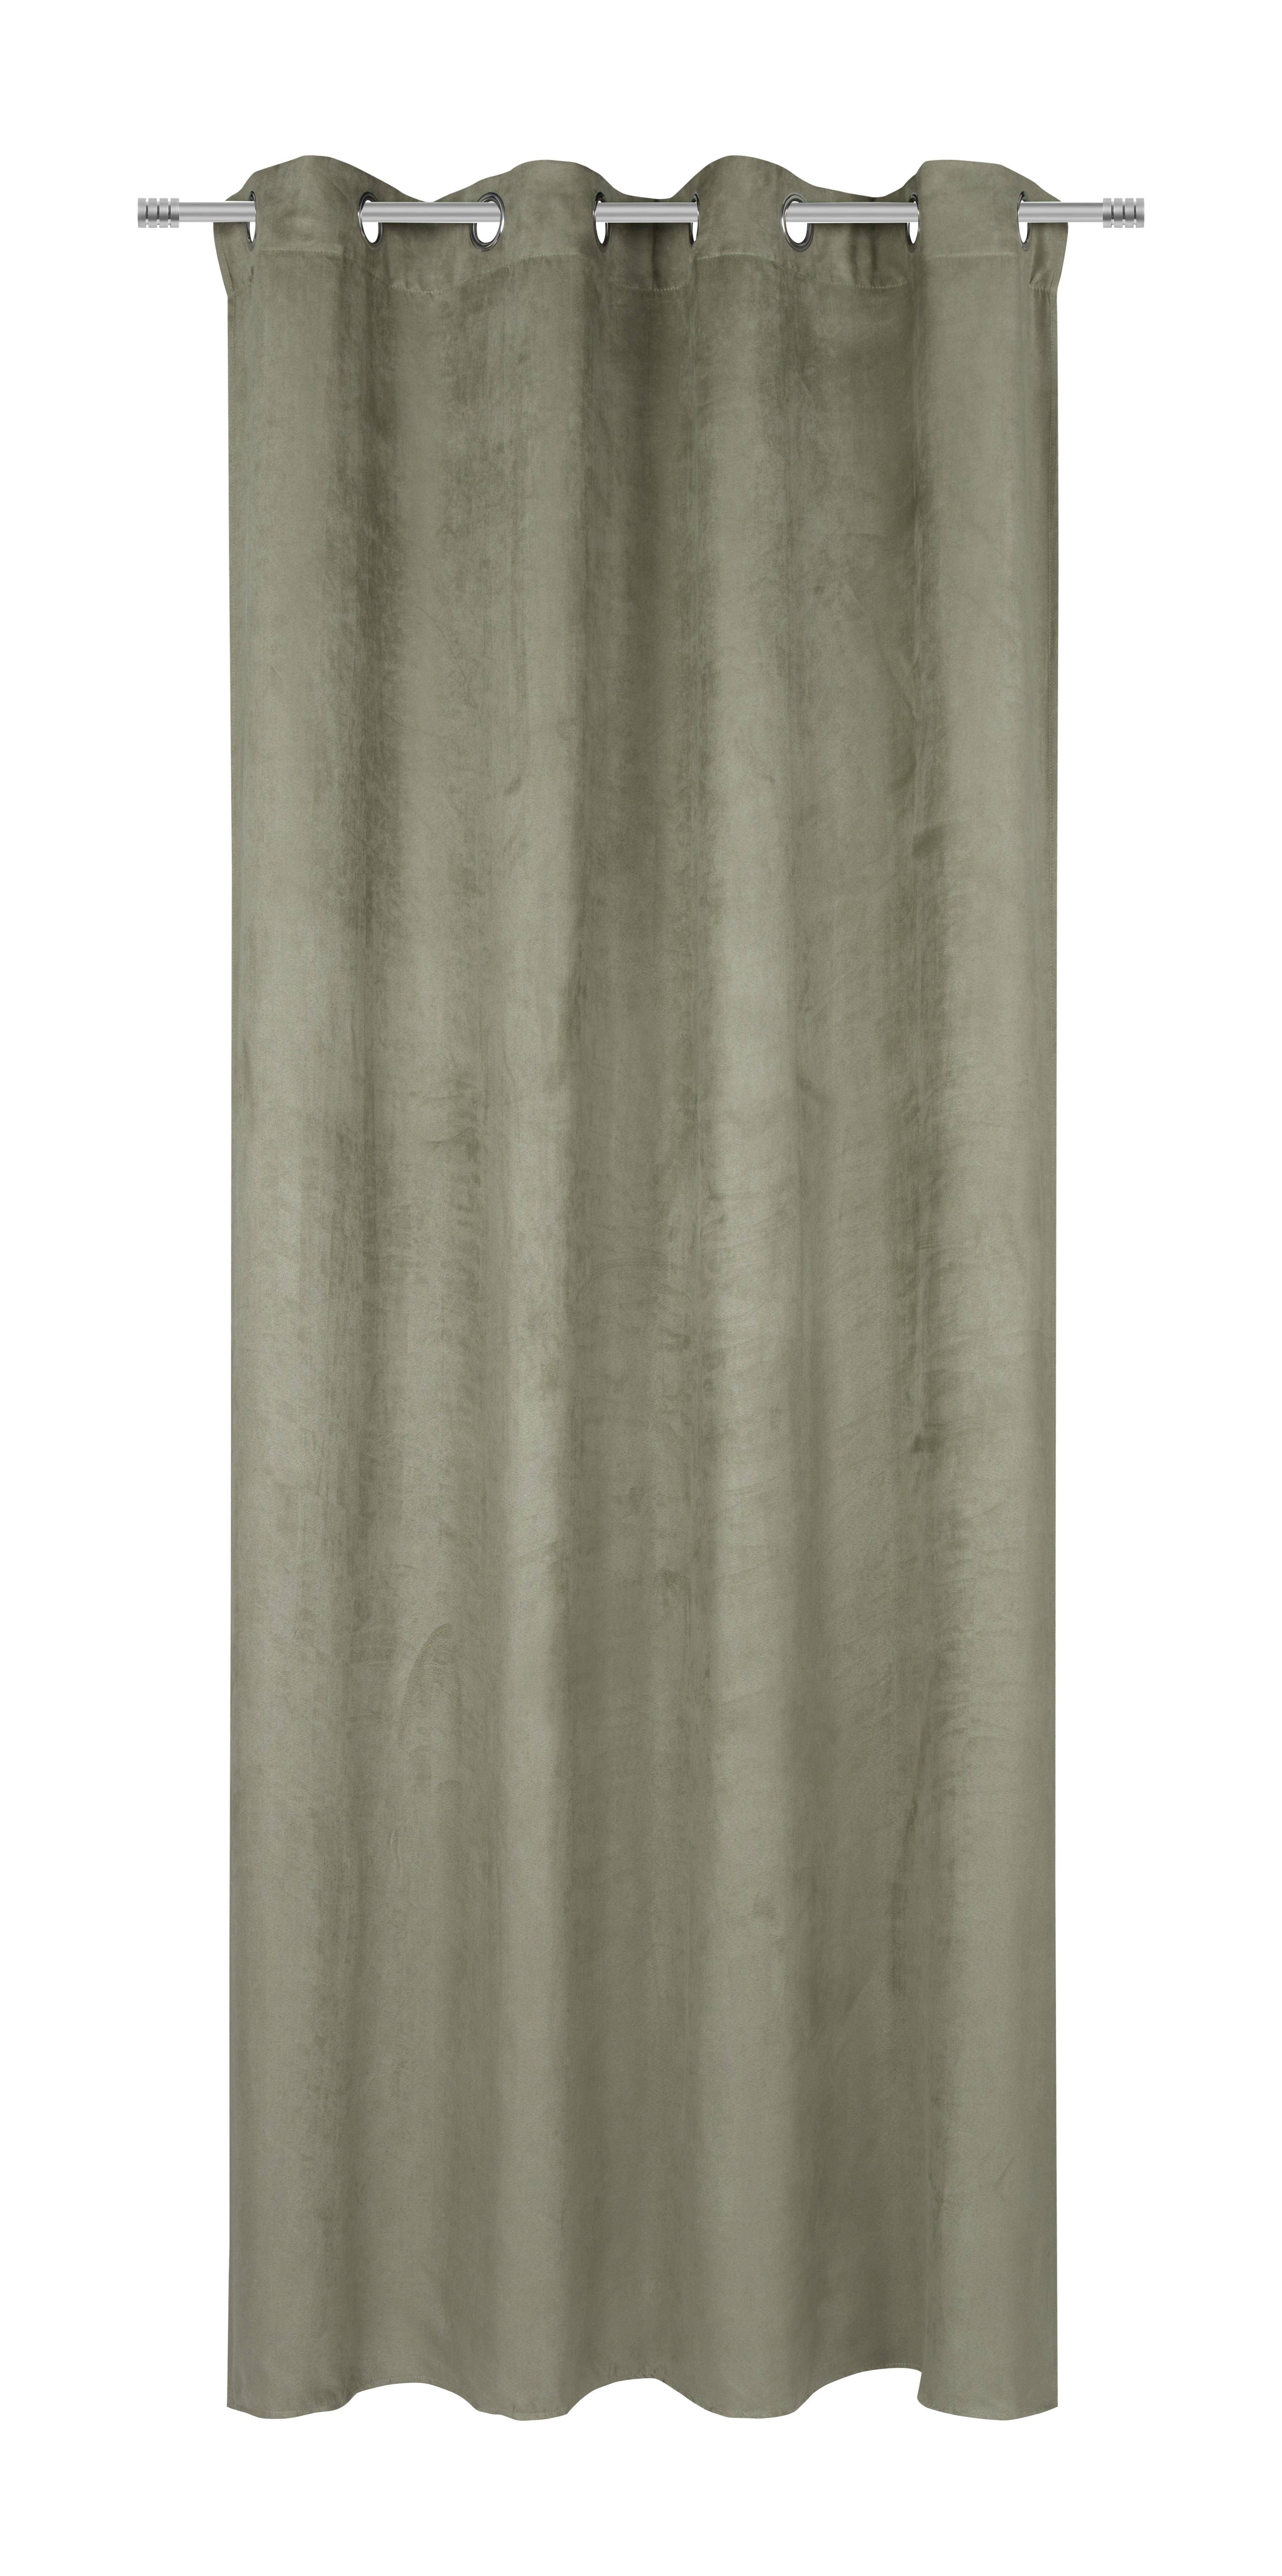 Ösenvorhang Velours in Grün ca. 140x245cm